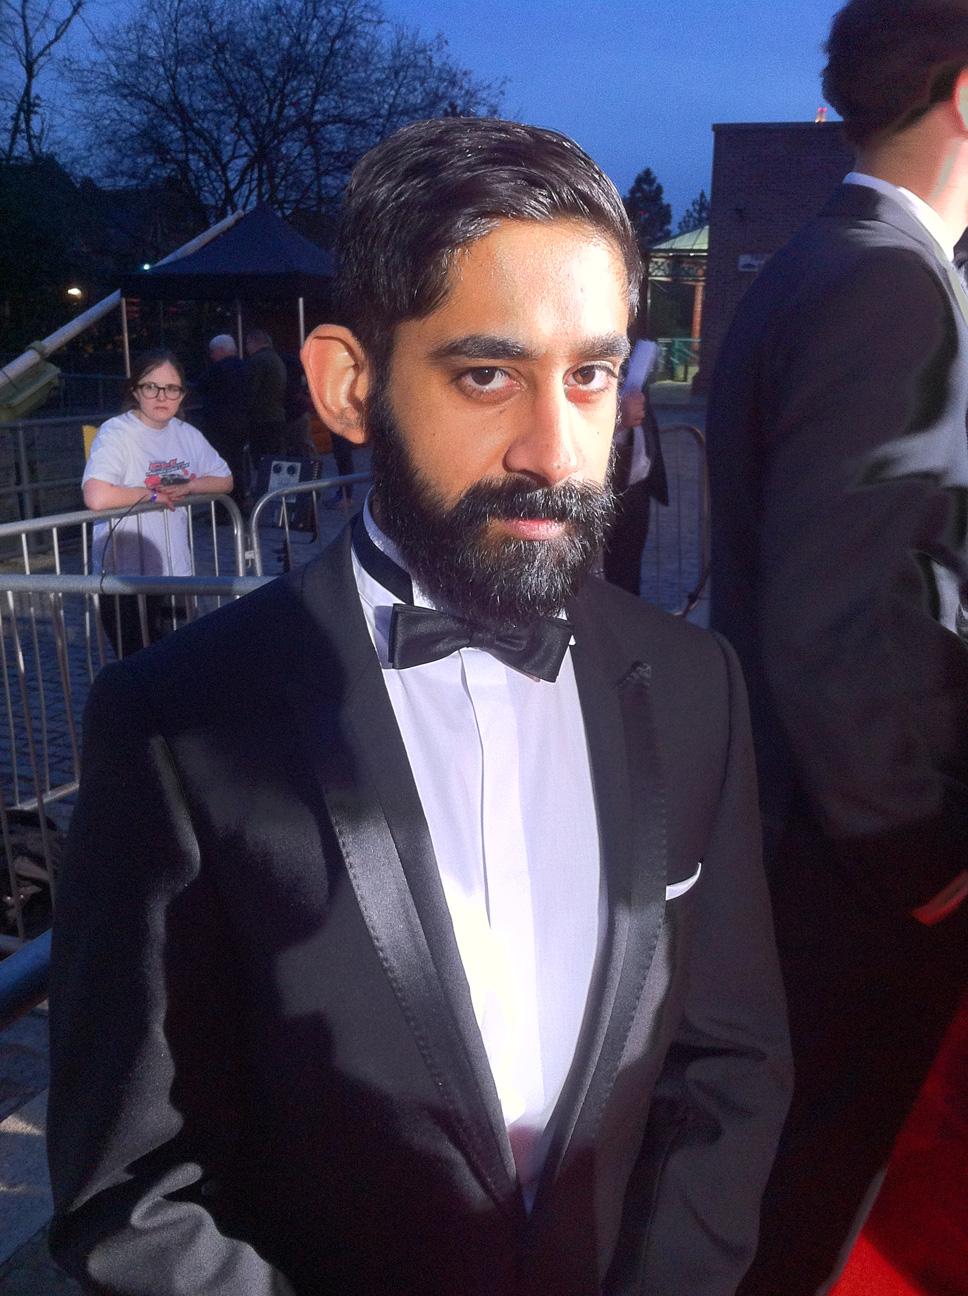 Manesh striking a pose on the red carpet on BAFTA night